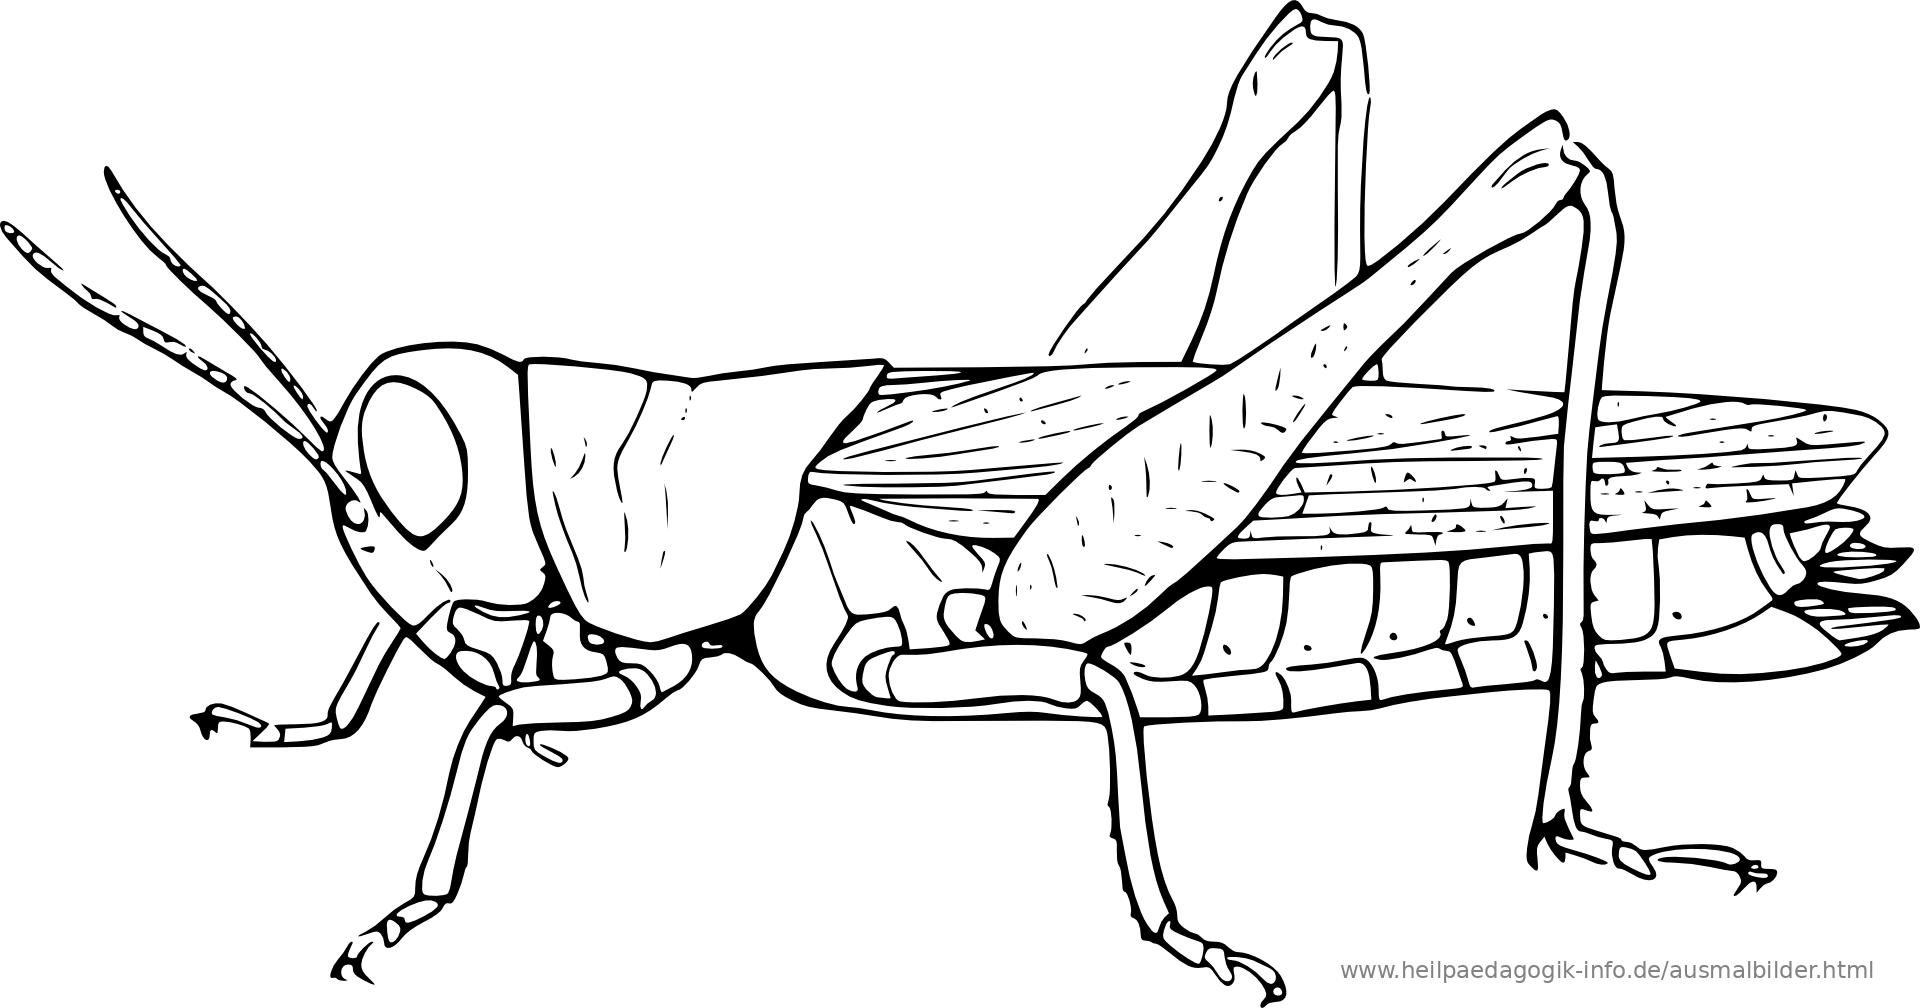 Ausmalbilder Käfer, Schmetterlinge, Insekten